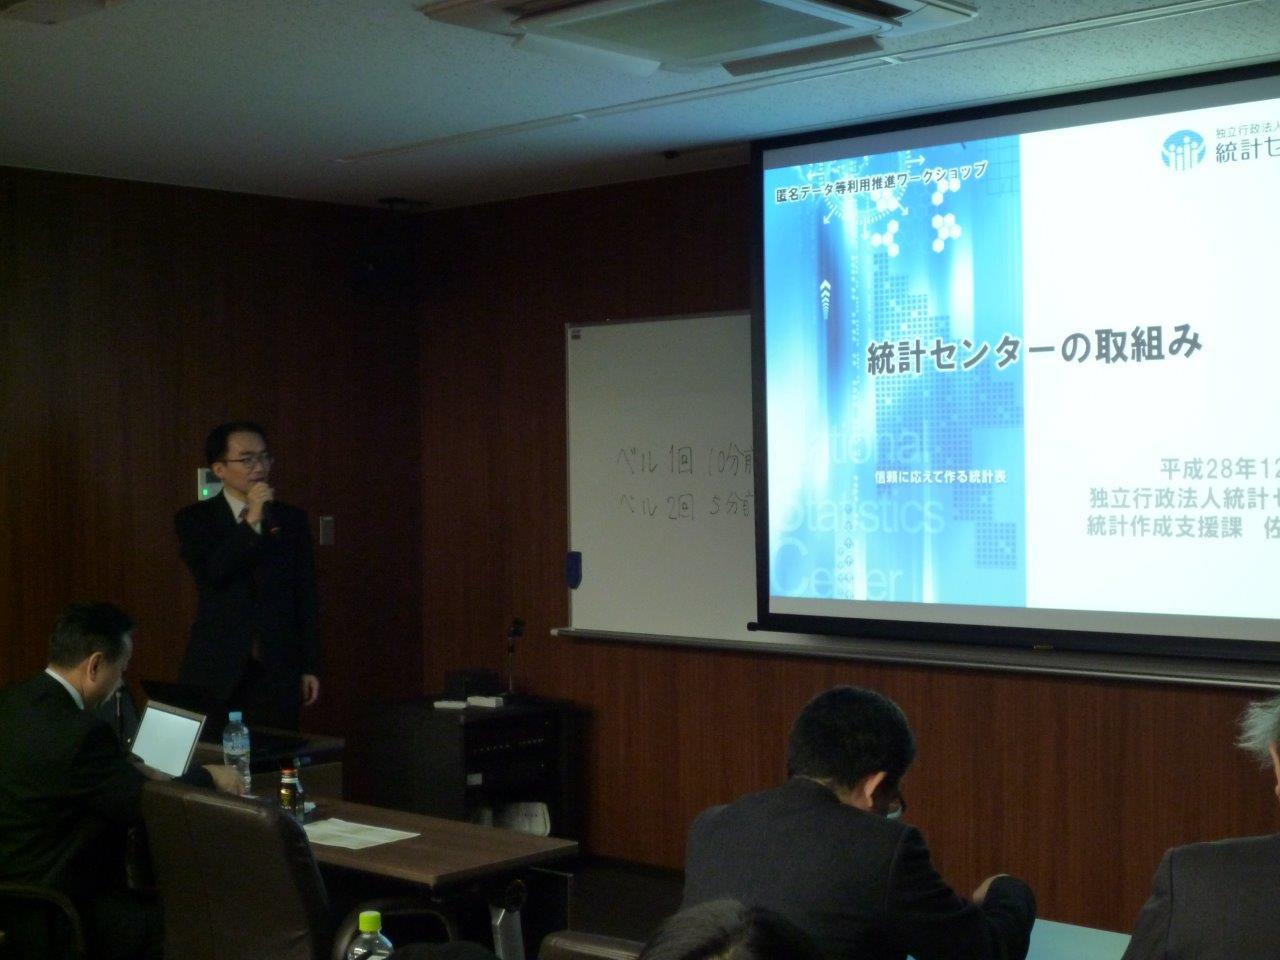 http://rcisss.ier.hit-u.ac.jp/Japanese/micro/information/P1040208.jpg